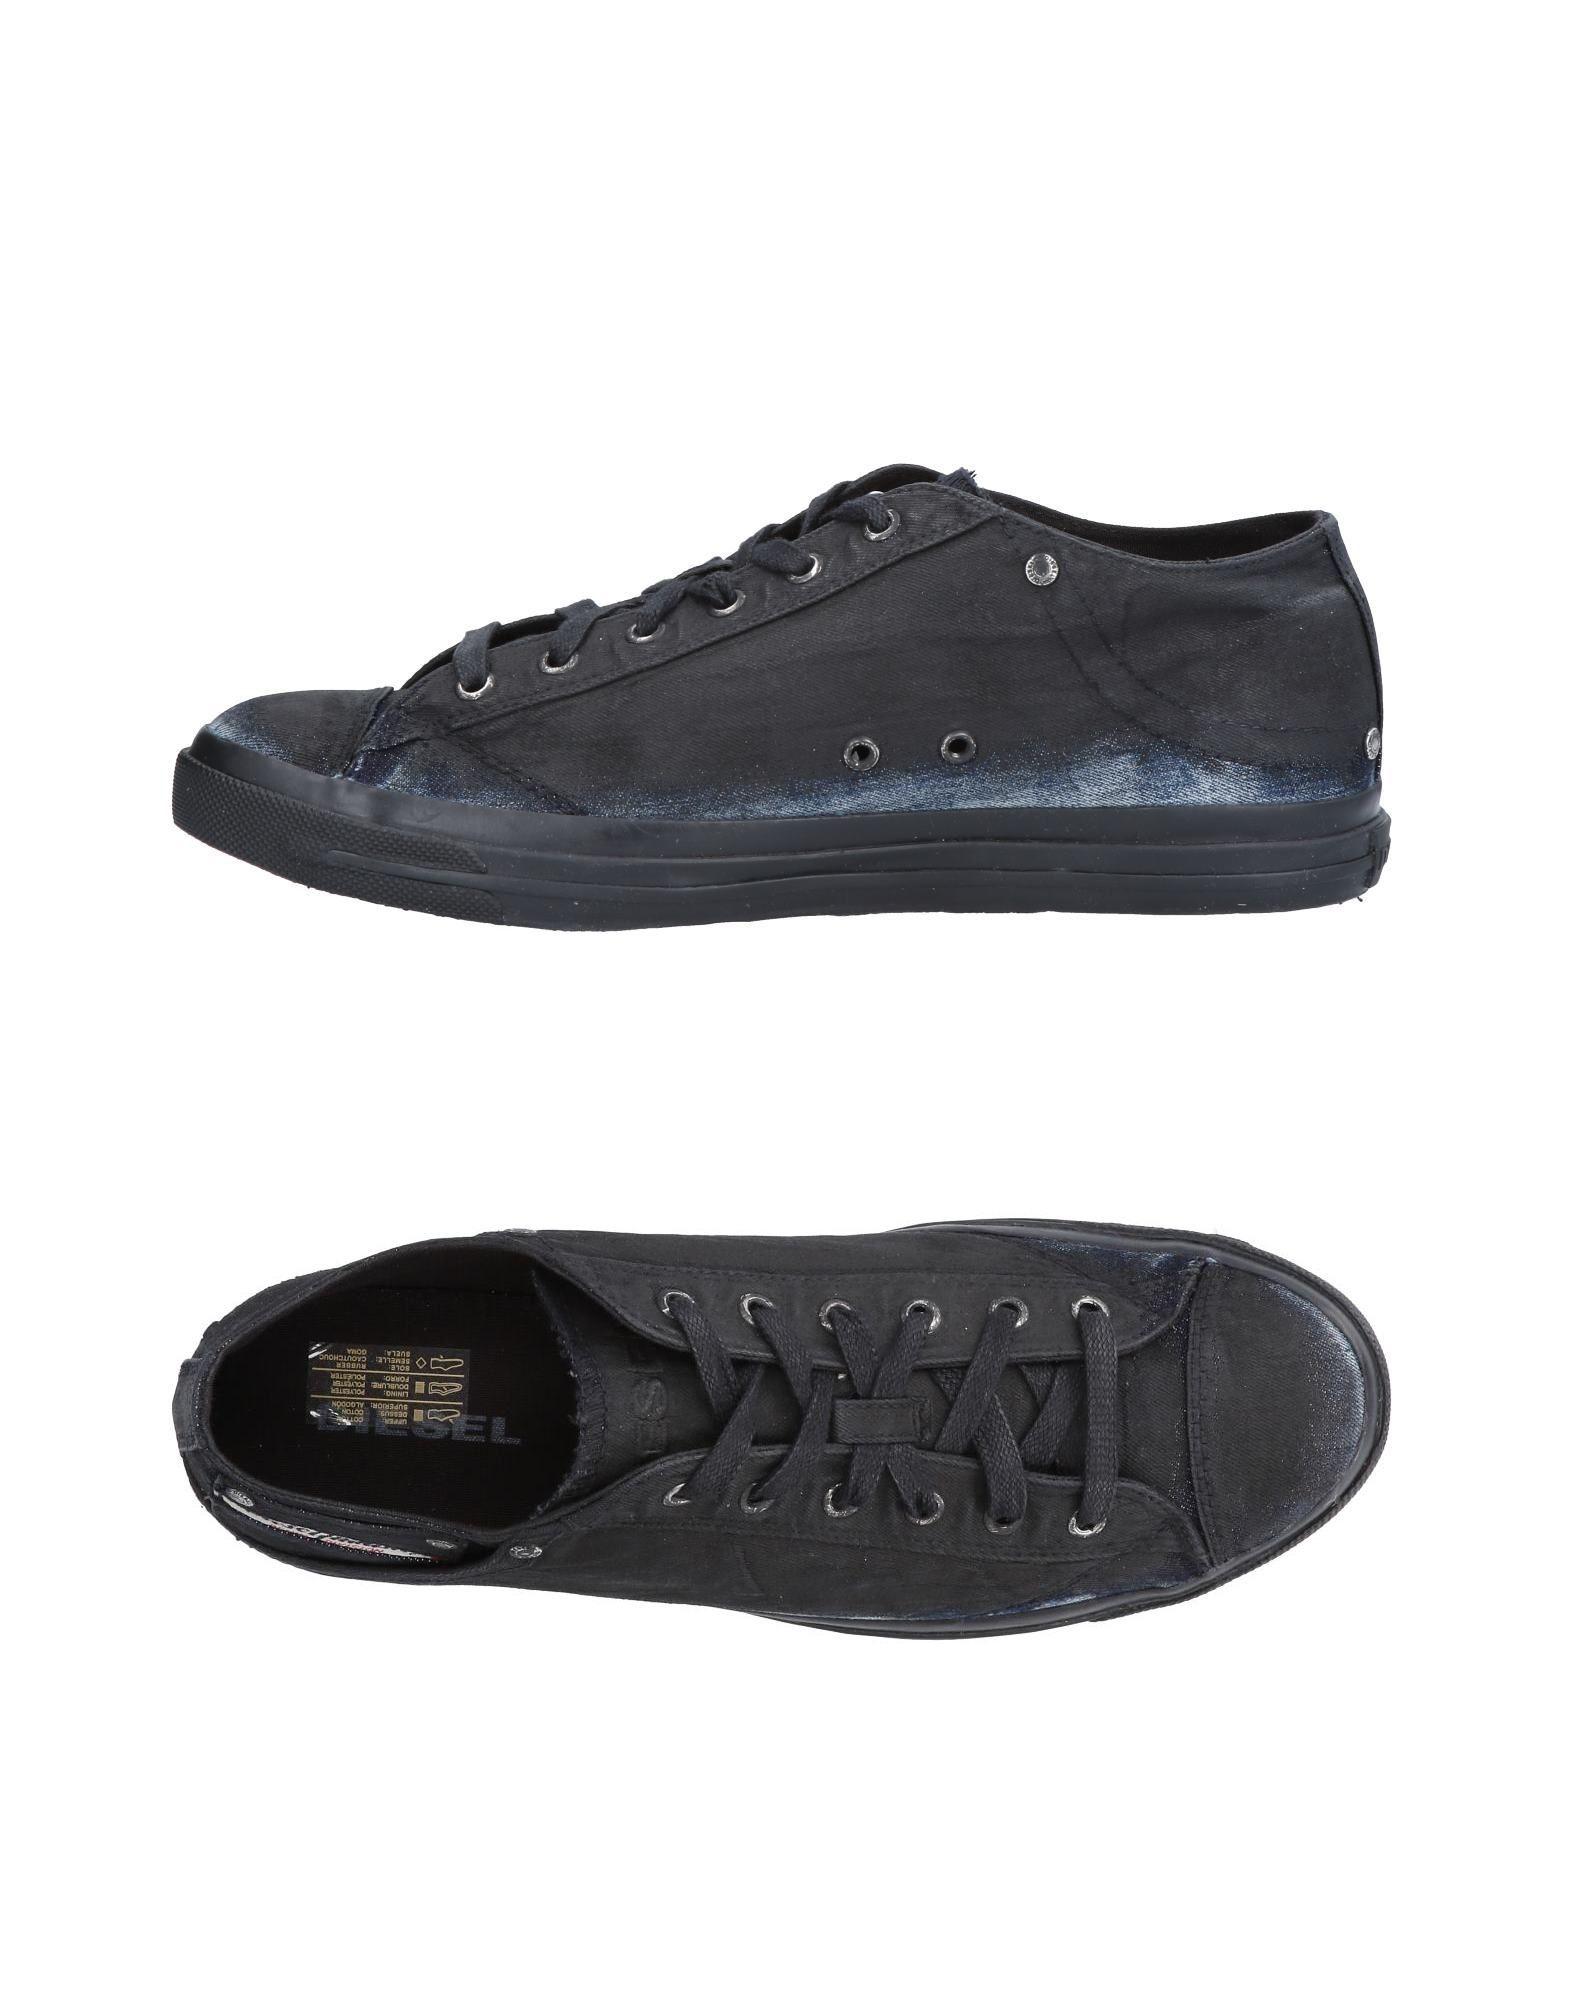 Moda Sneakers Diesel Uomo - 11495430JC